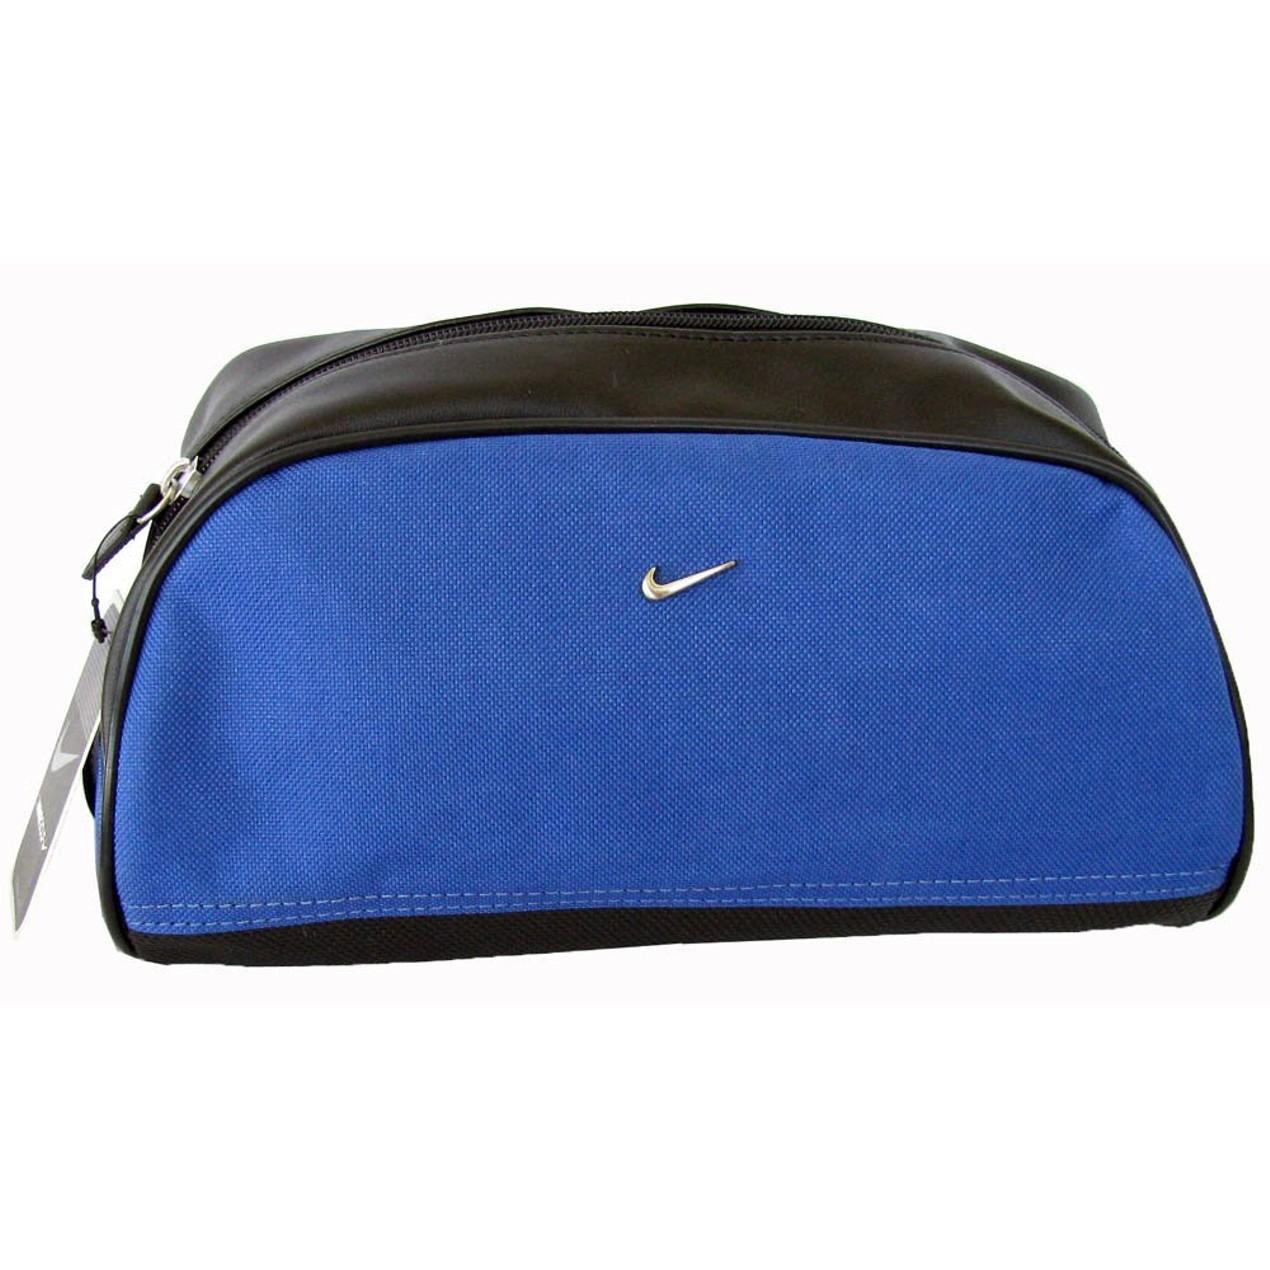 d05c7df57233 Nike Golf P1400 Blue Travel Toiletry Bag - Tanga